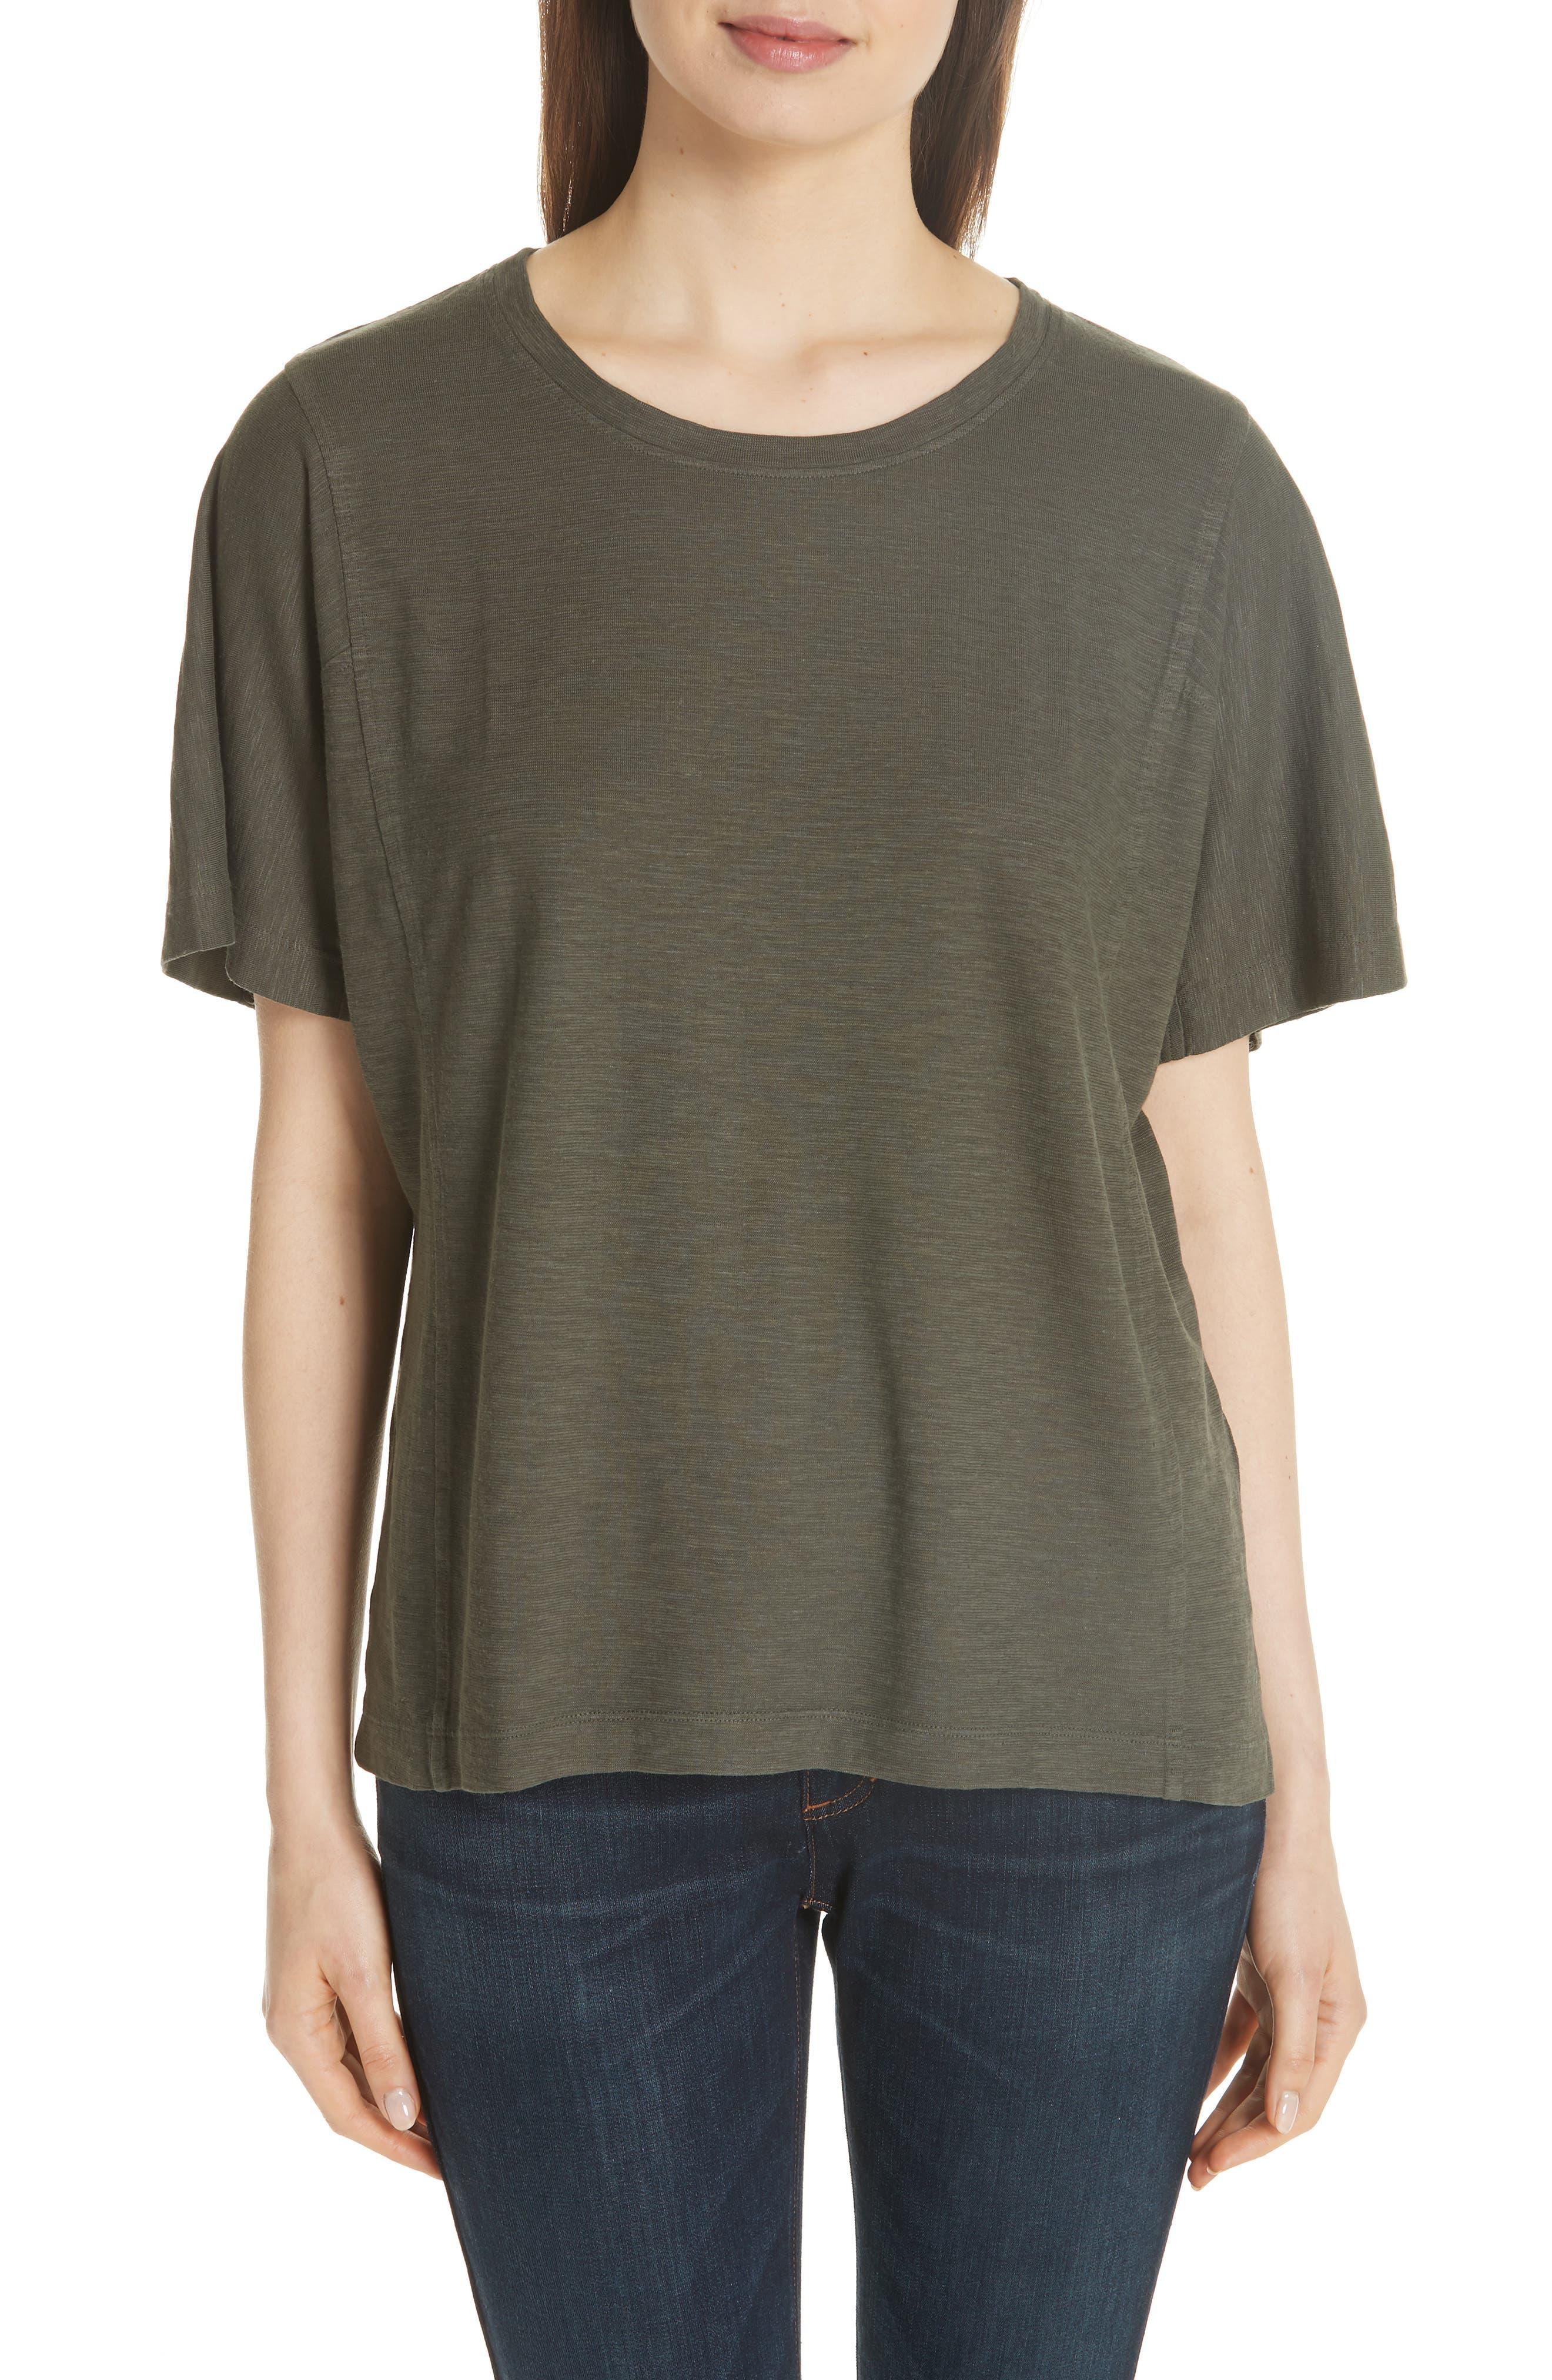 Eileen Fisher Hemp & Organic Cotton Top (Regular & Petite)